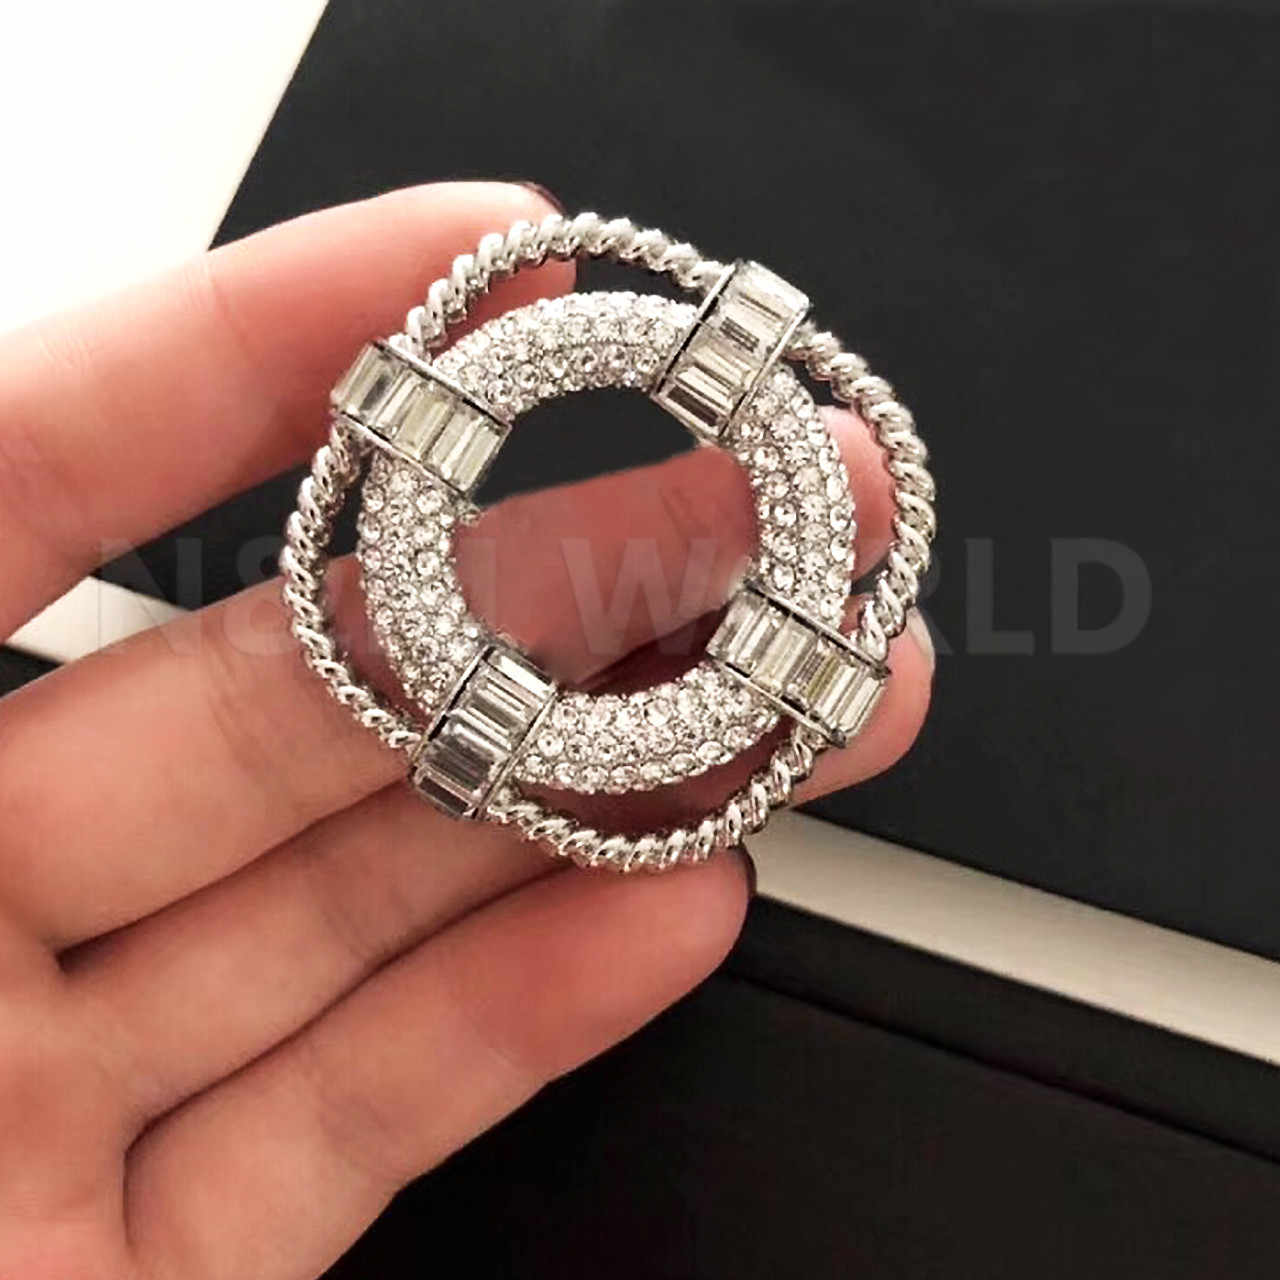 Fashion Perhiasan Penuh Batu Bros Pesta Sweater Brooche Tanda Tangan C Nama Cap Bros 2019 Hot Merek Fashion Perhiasan